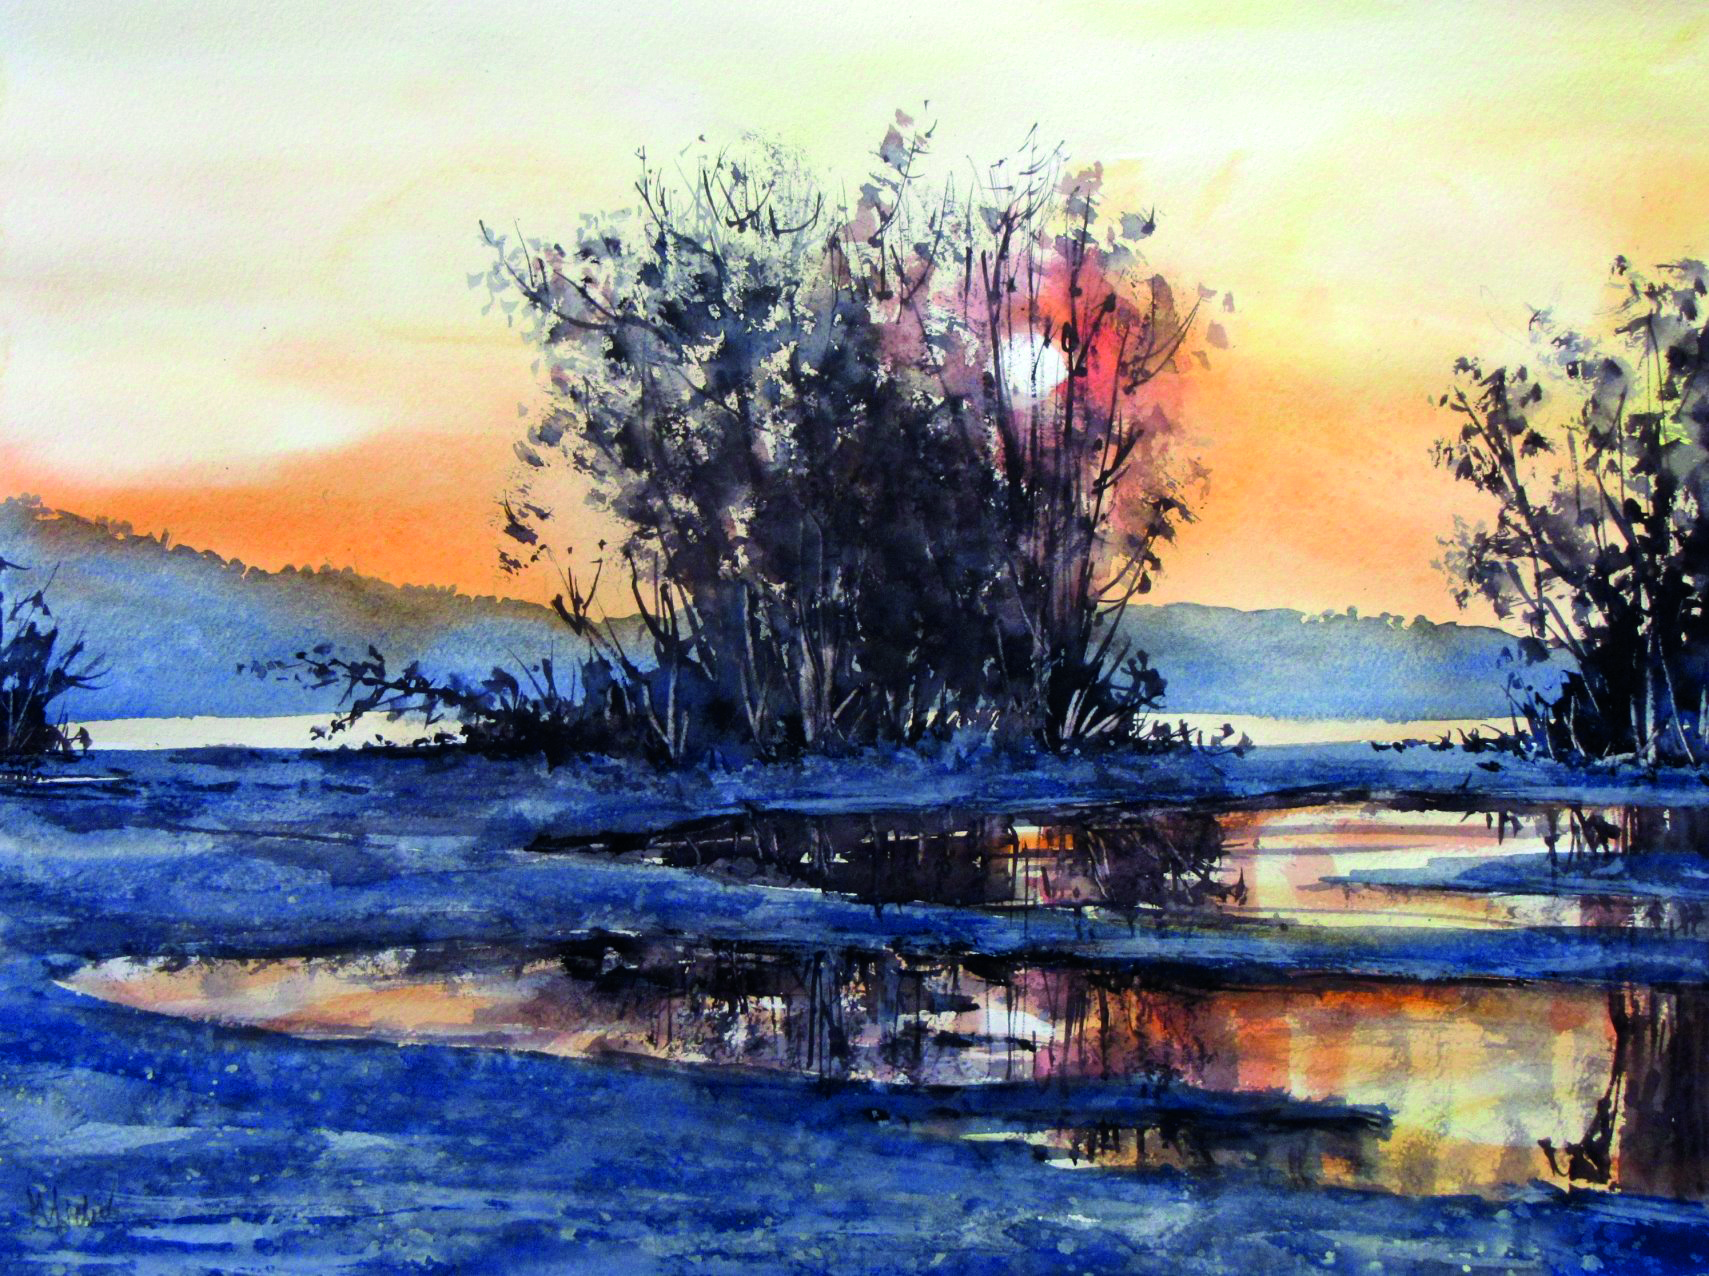 Manfred Sieber | Abend am Fluss